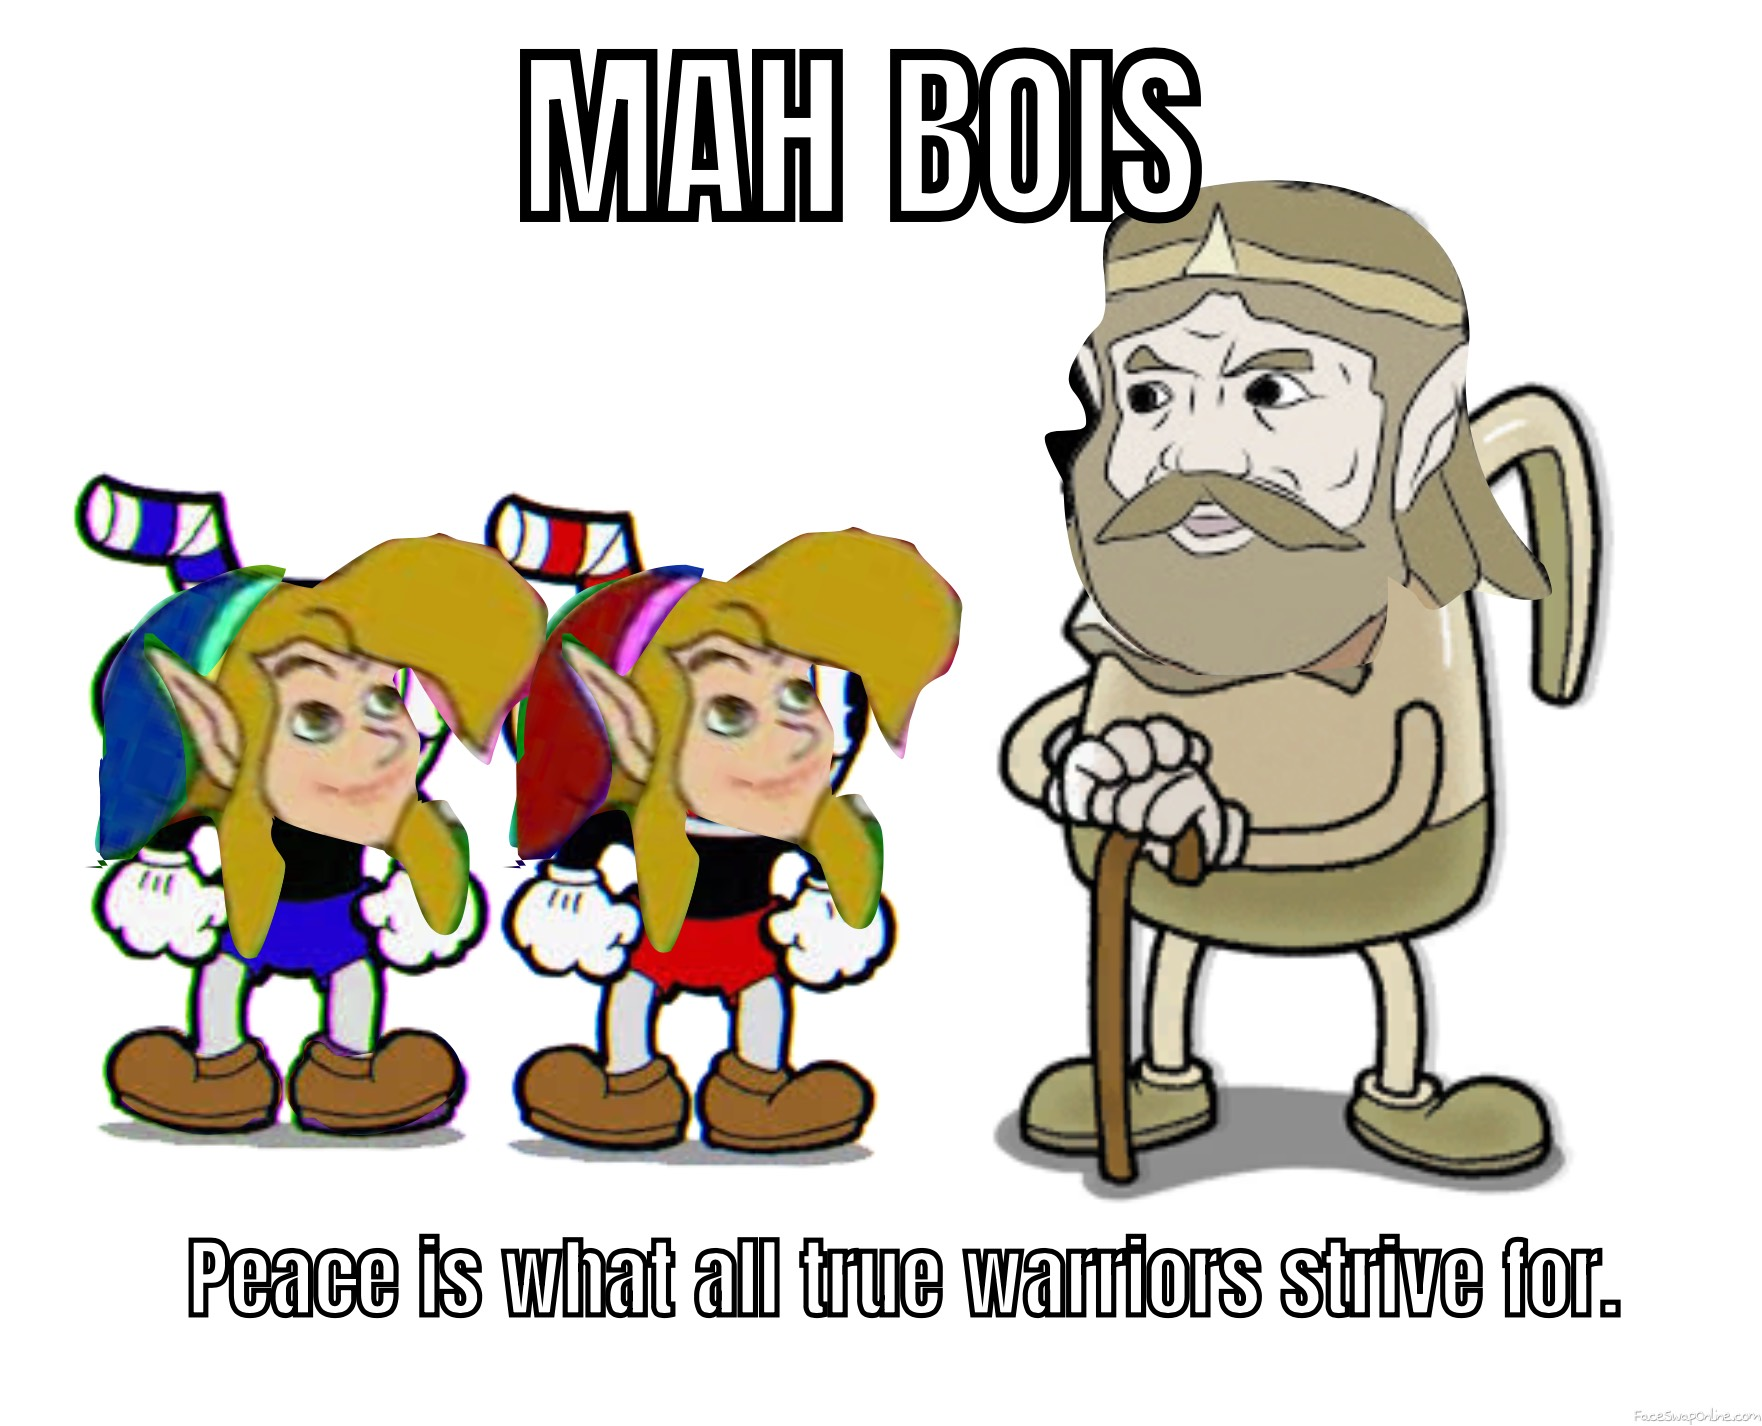 Mah Bois